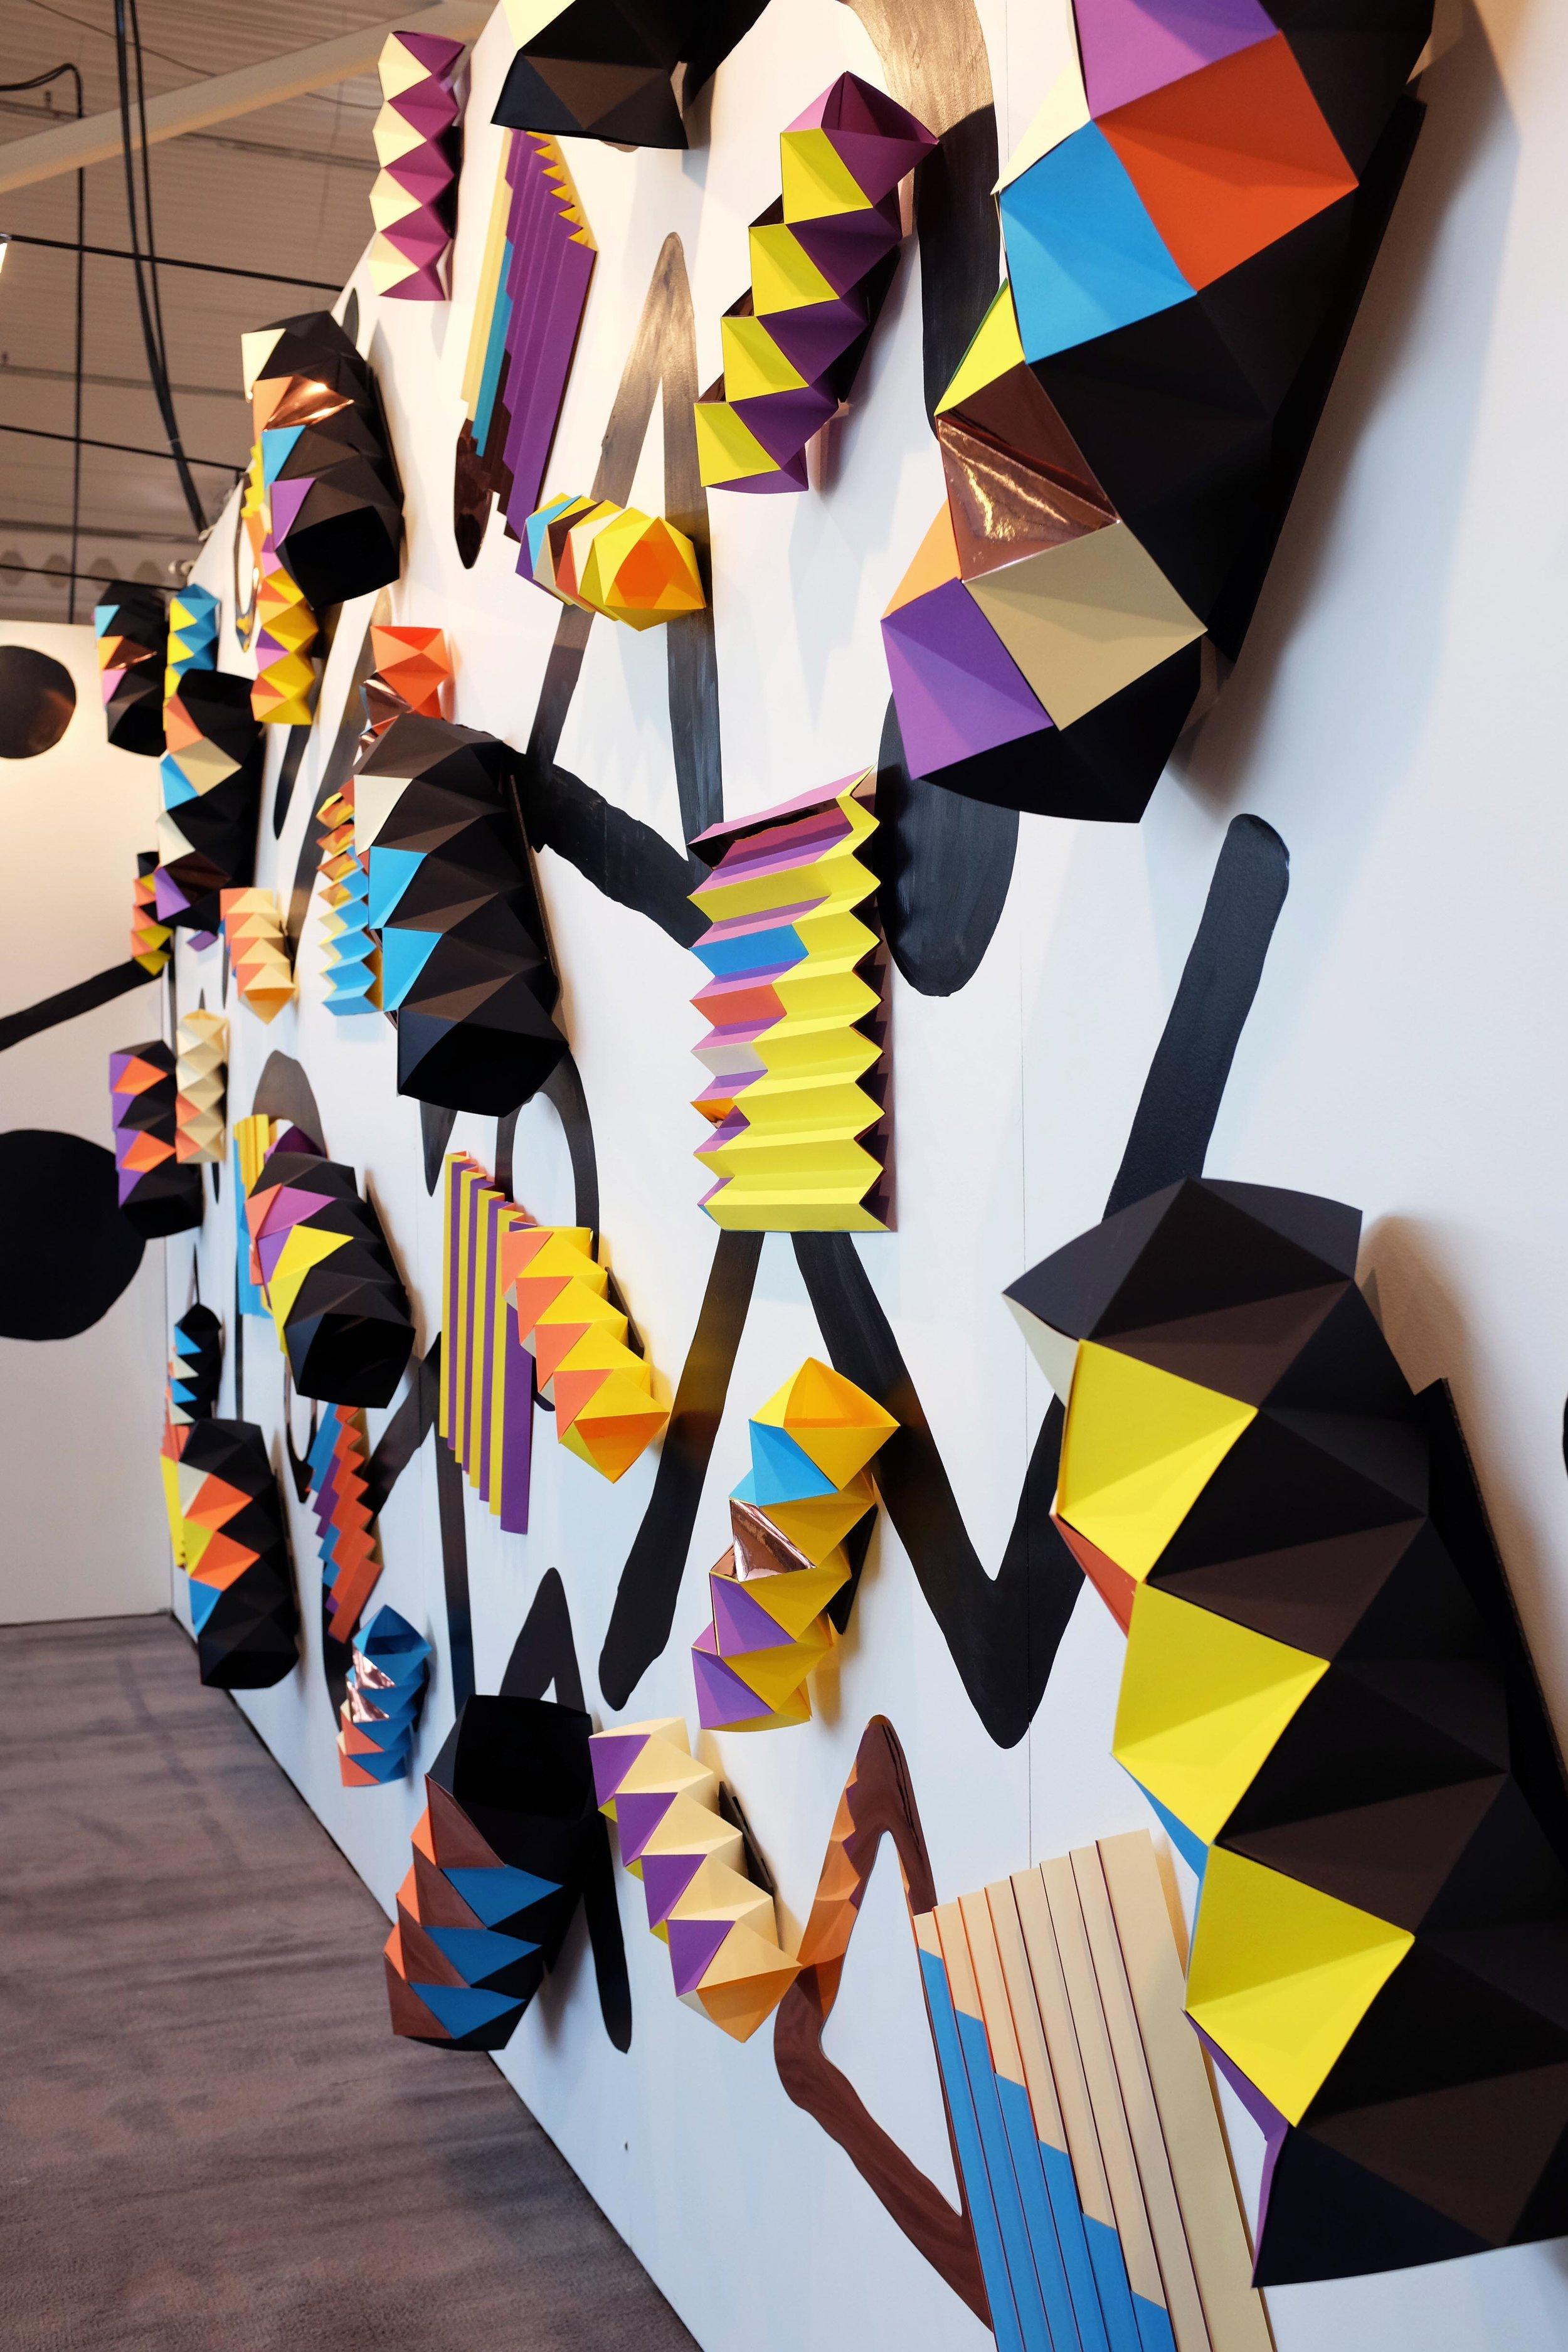 miss-cloudy-pauline-loctin-artist-project-2019-paper-art-origami-entrance-toronto-9.jpg